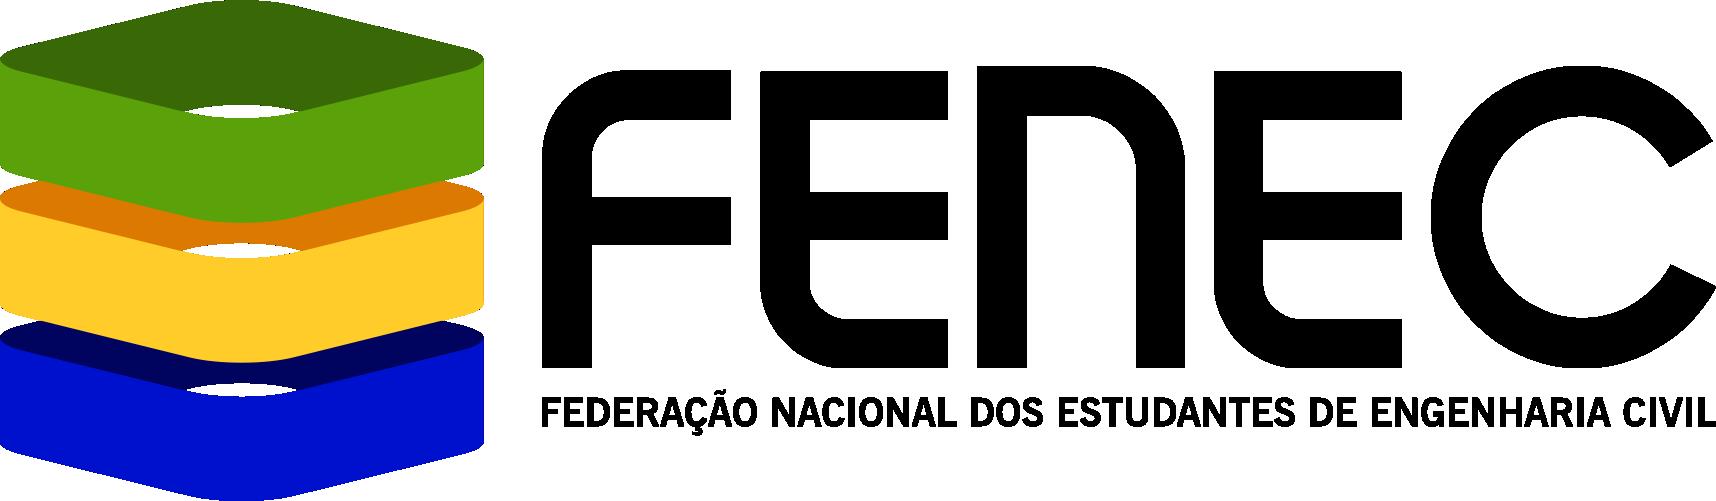 FENEC